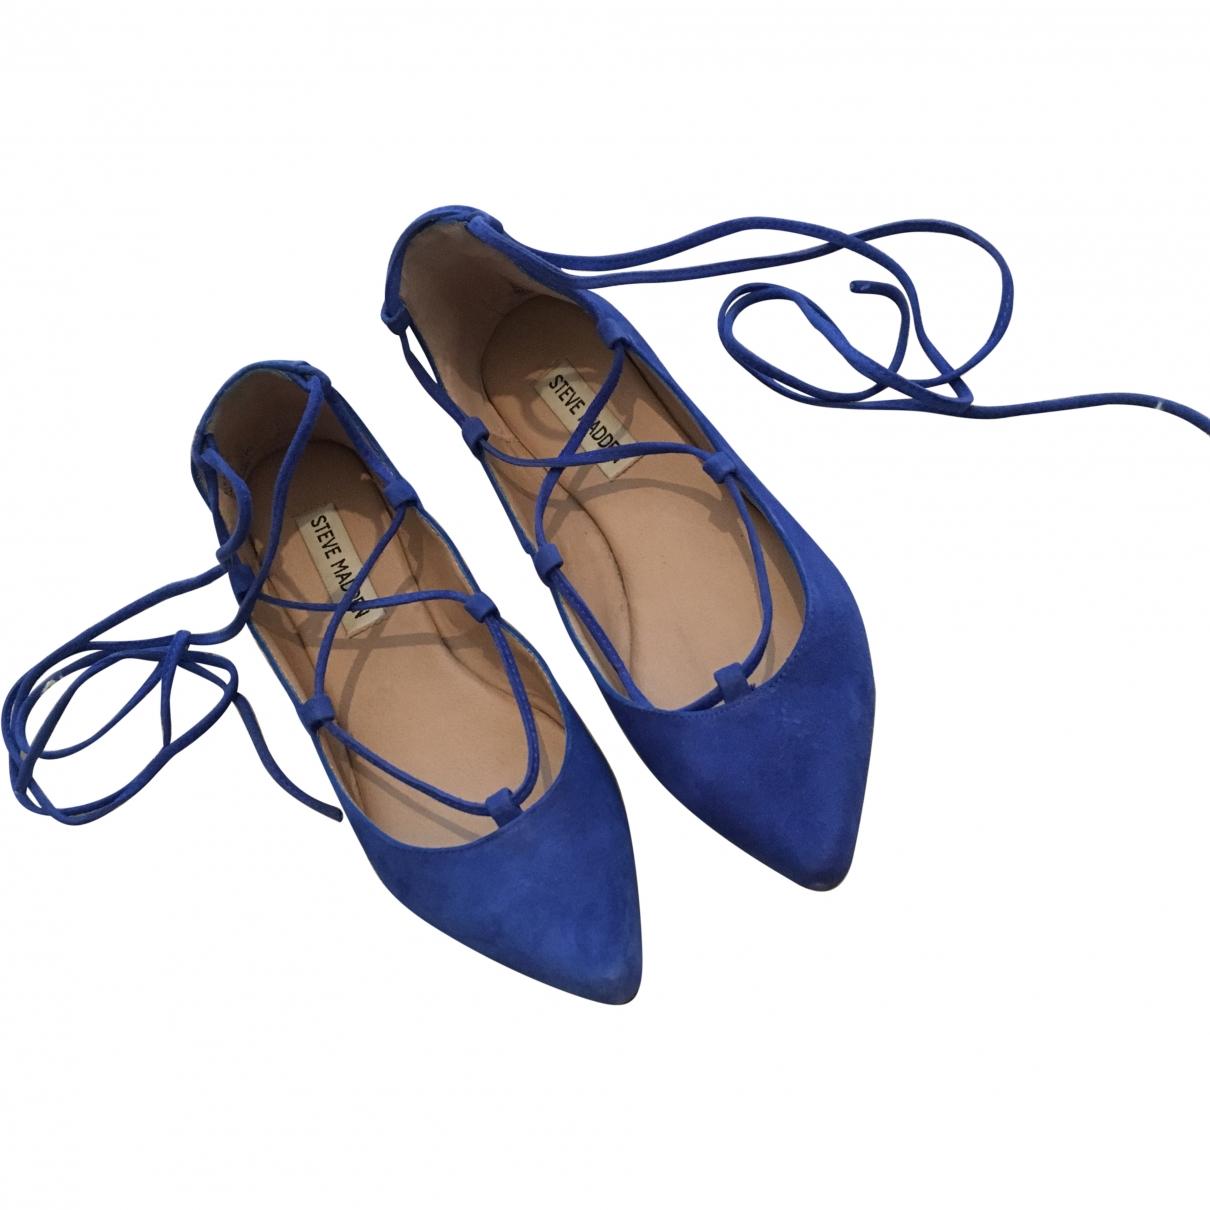 Steve Madden \N Blue Suede Flats for Women 6 US